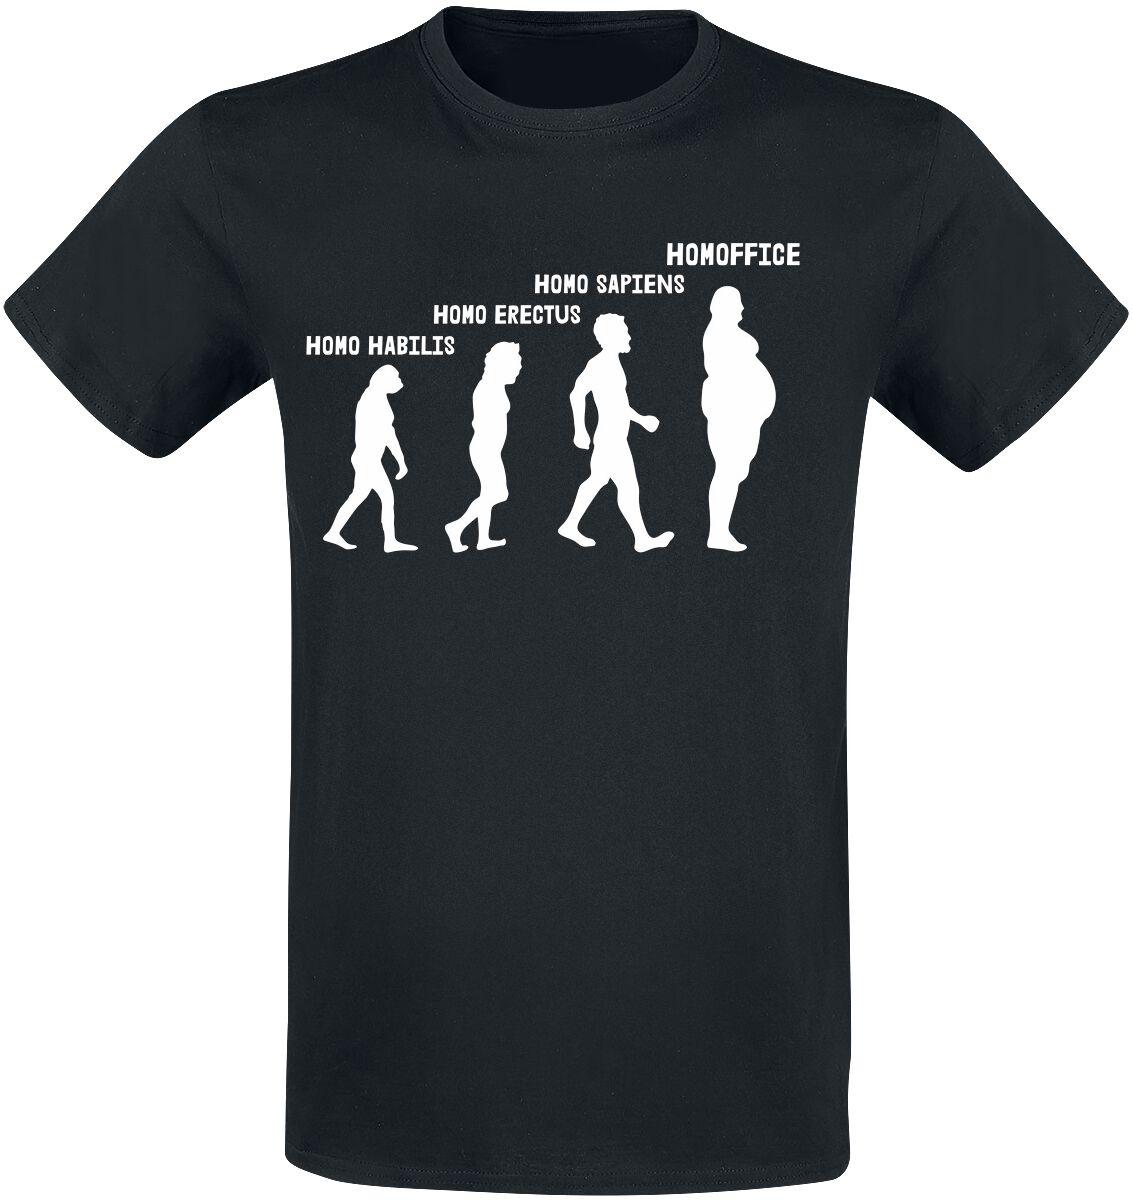 Homoffice T-Shirt schwarz POD - BY083 - 5373